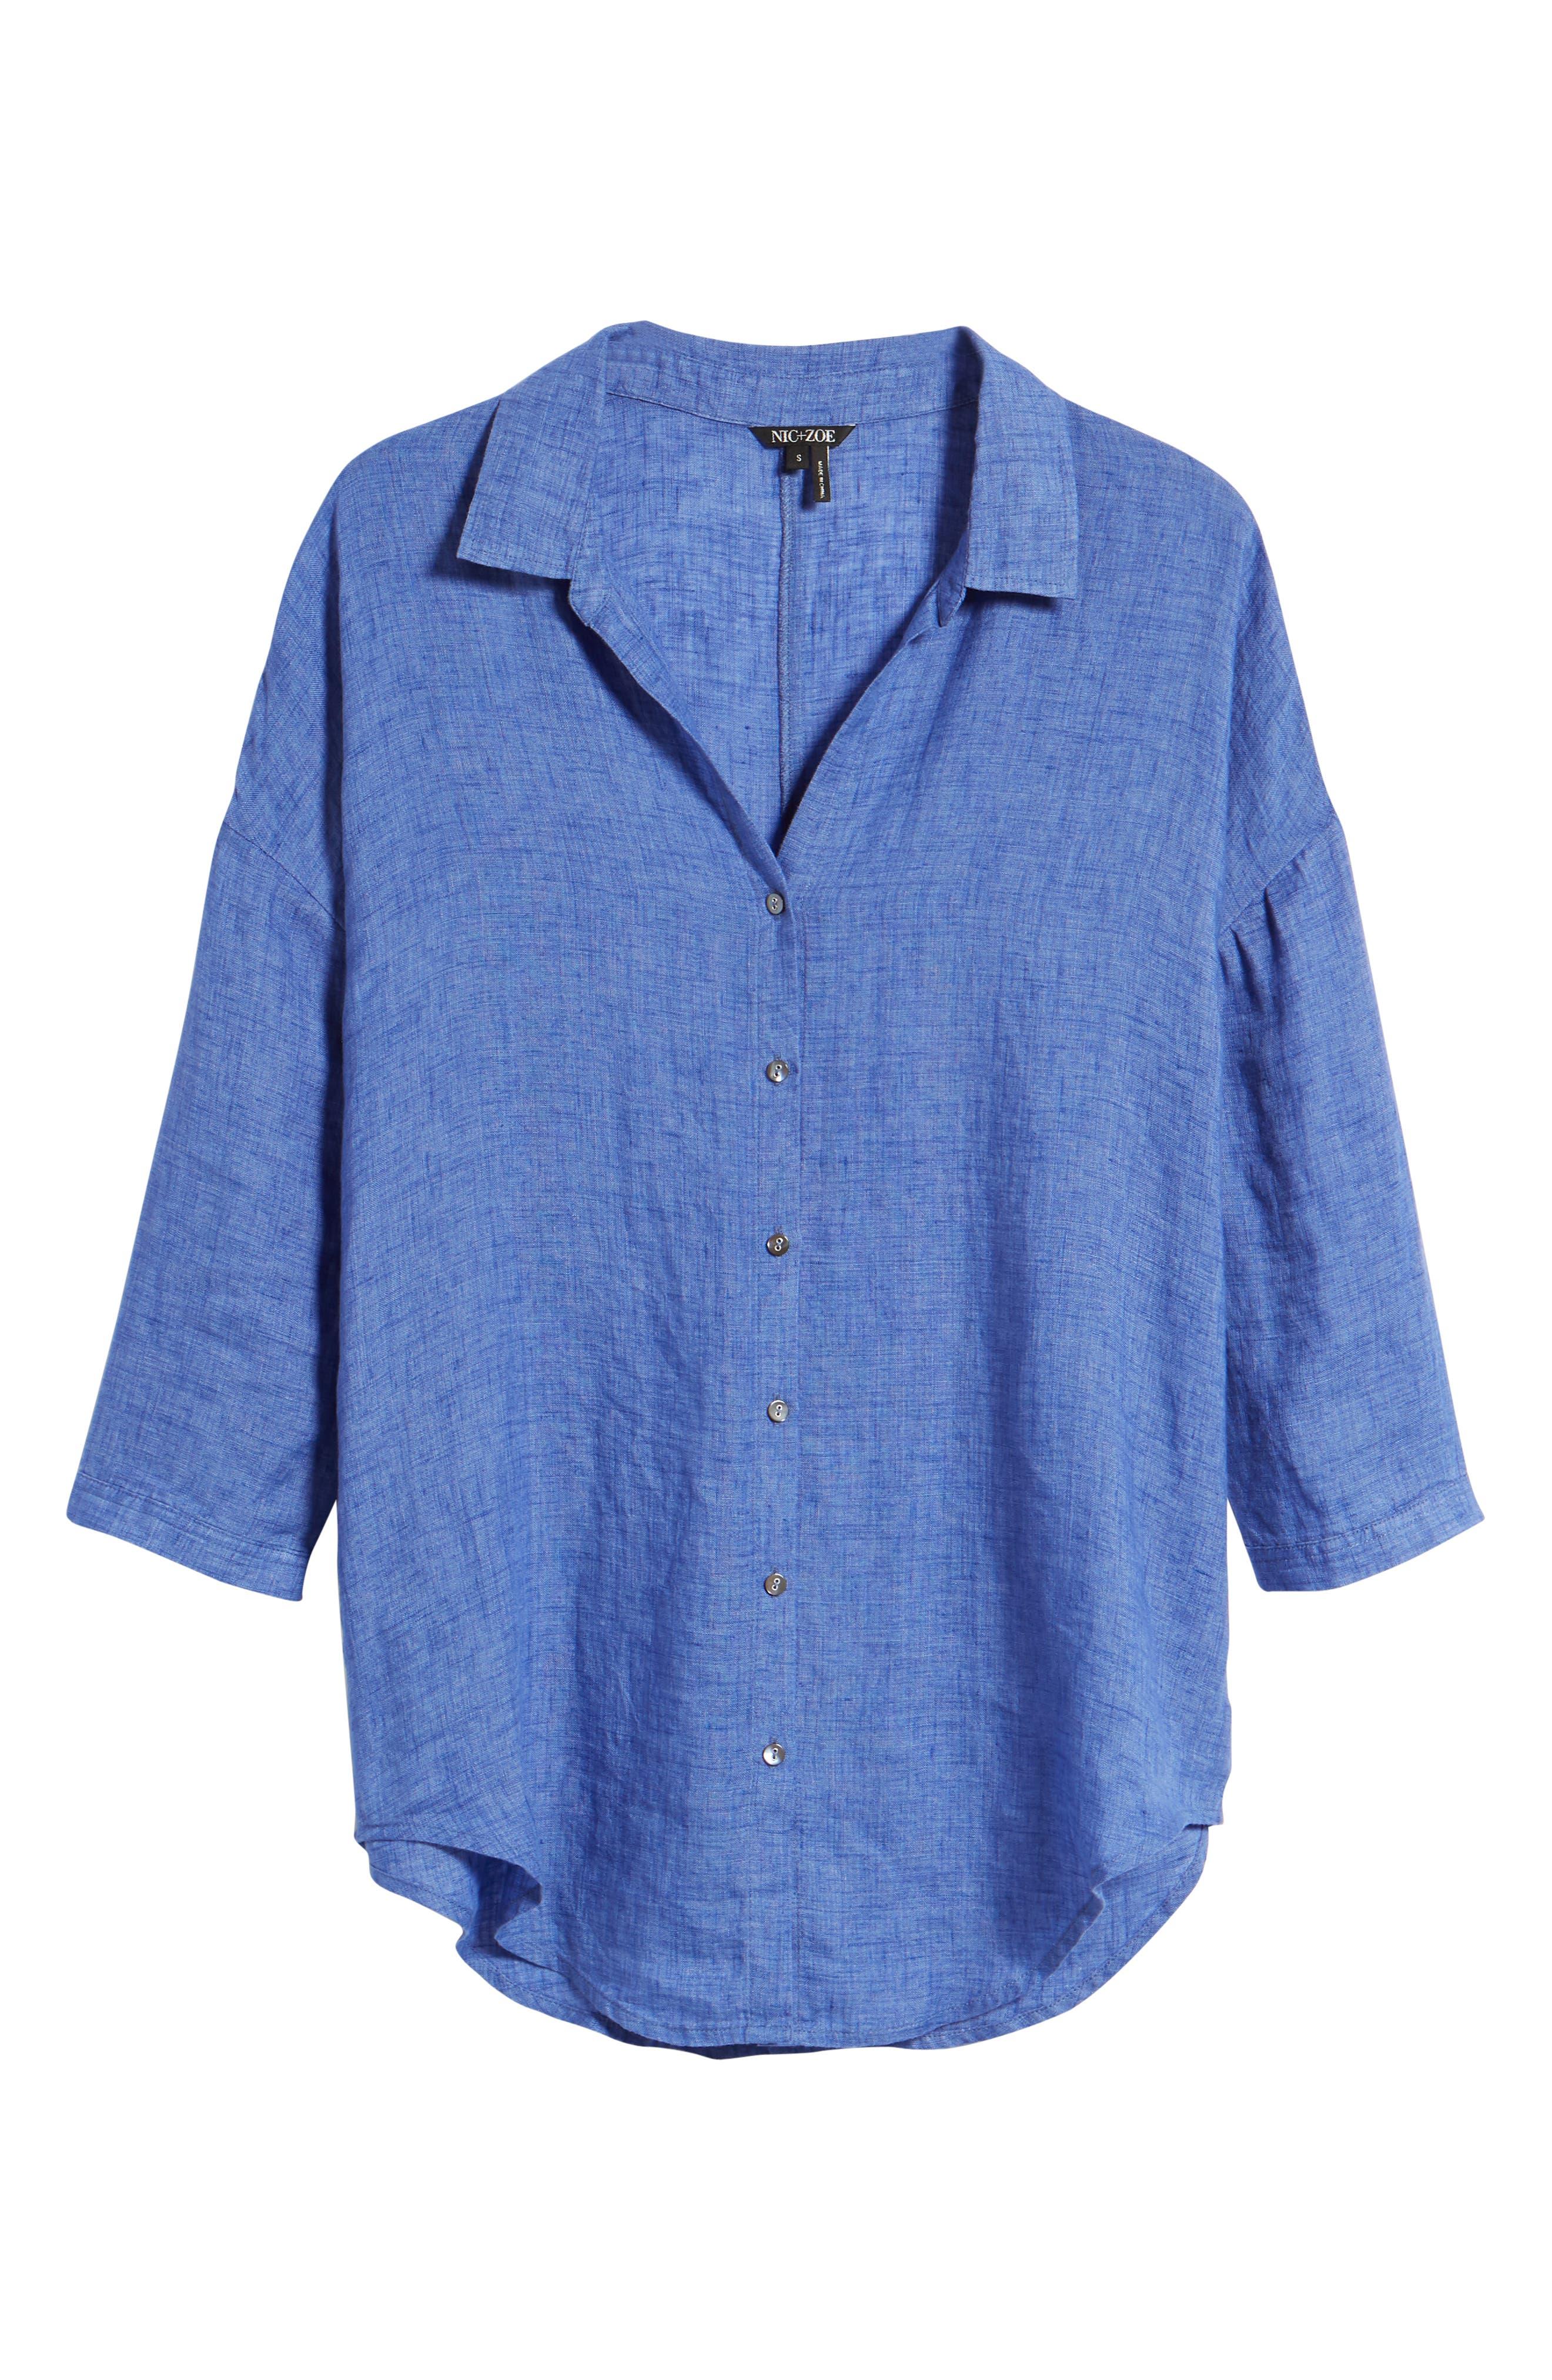 Joy Ride Linen Tunic Top,                             Alternate thumbnail 6, color,                             487